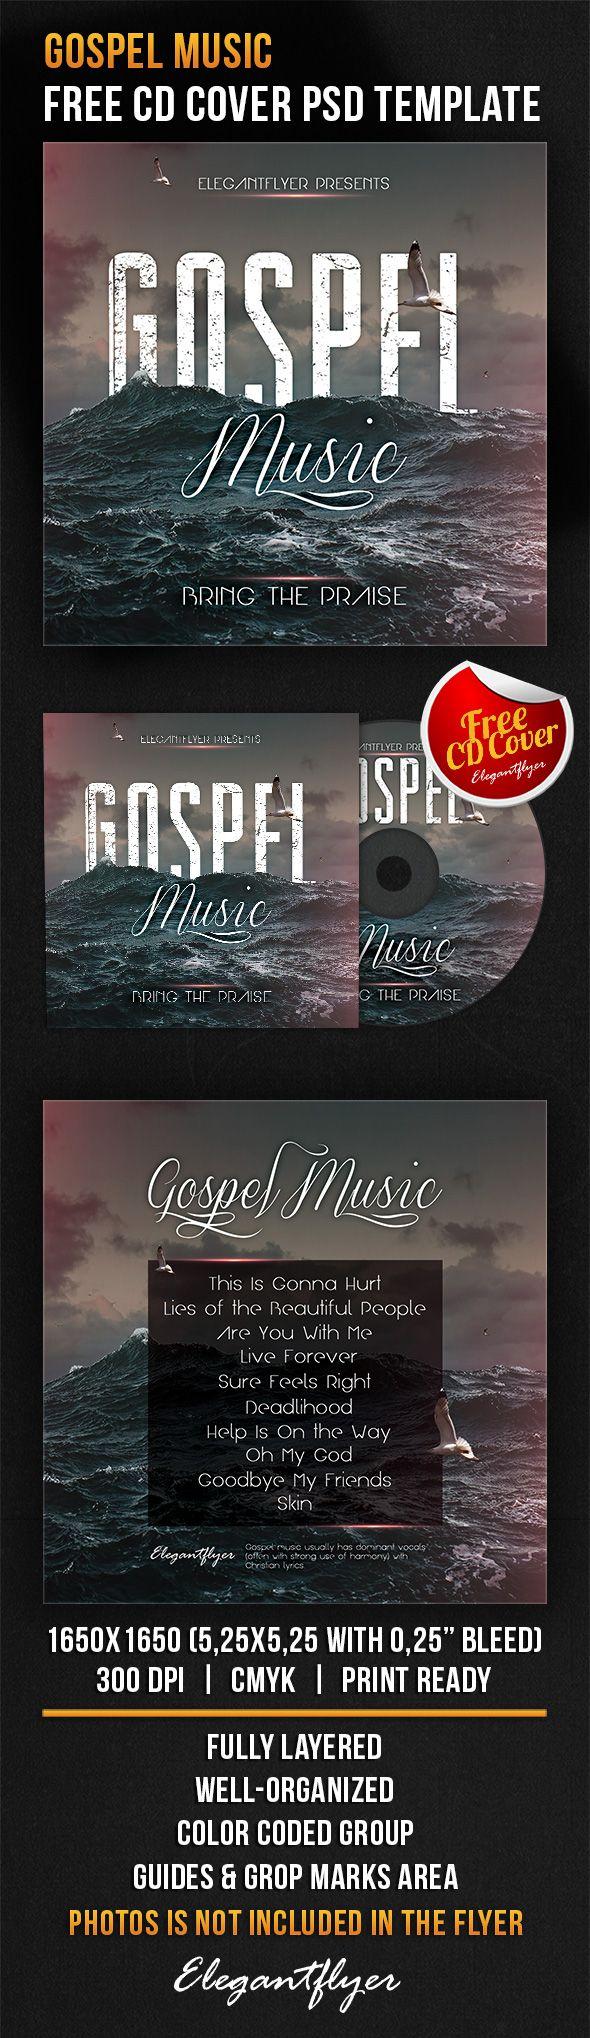 Gospel Music – Free CD Cover PSD Template https://www.elegantflyer.com/free-cd-dvd-templates/gospel-music-free-cd-cover-psd-template/